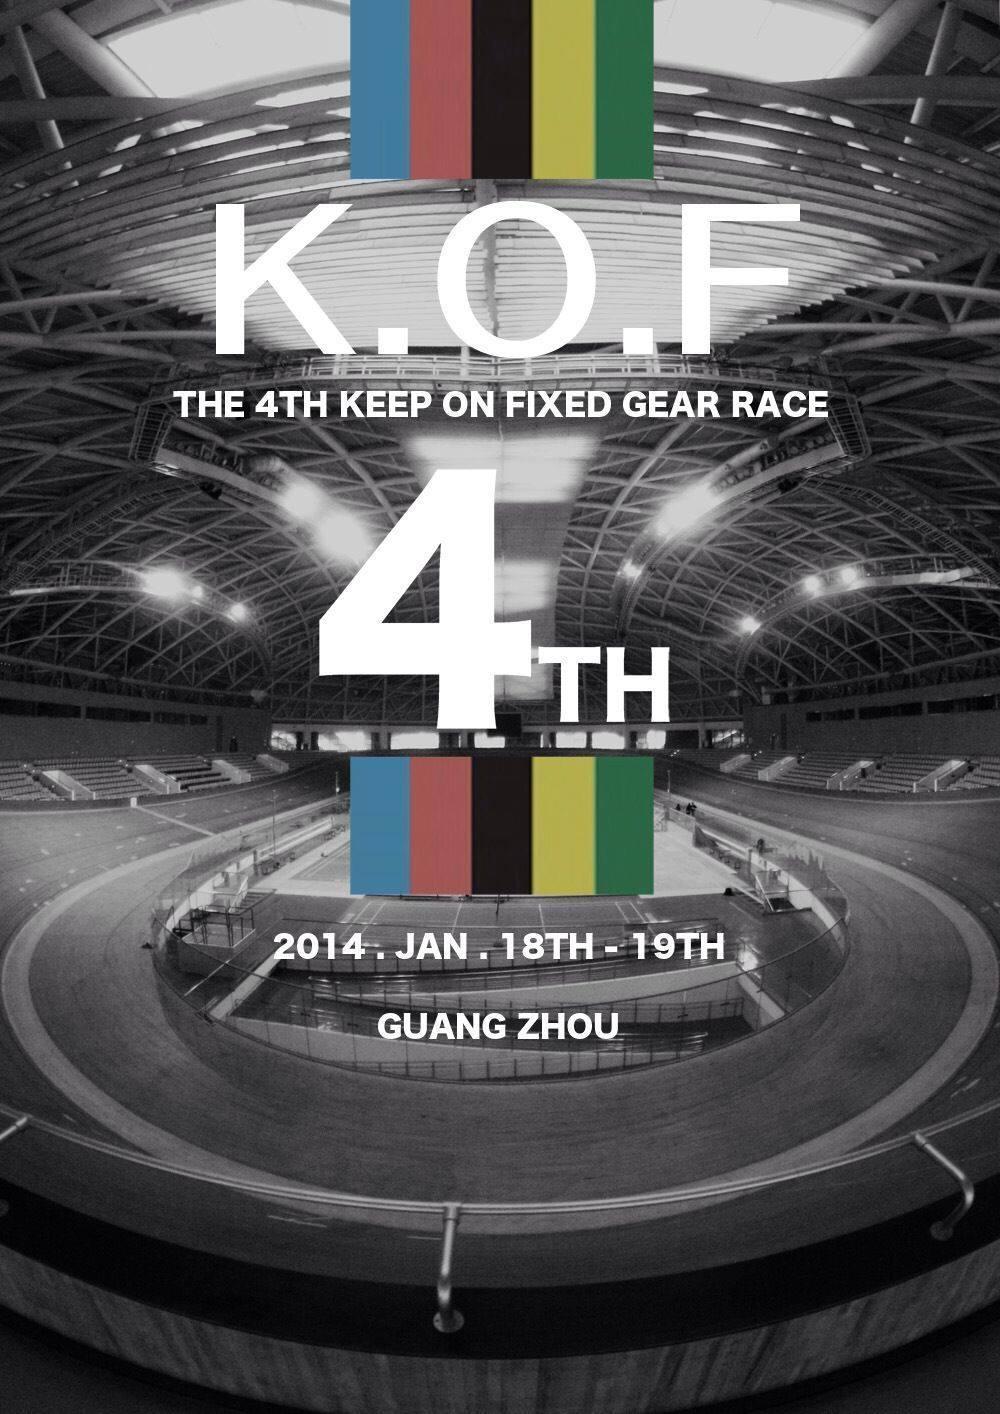 Keep On Fixed 4th ----第四届 K.O.F 固定齒輪自行車大賽    踏入2014年,K.O.F 大賽為新一年的賽事揭開序幕,作為南方一年一度的大賽,  今年賽會更加入了Keirin賽,讓大家有機會在亞運室  內場飛馳!    活動名稱:K.O.F 固定齒輪自行車大賽   日期:1月18~19日   地點:廣州大學城